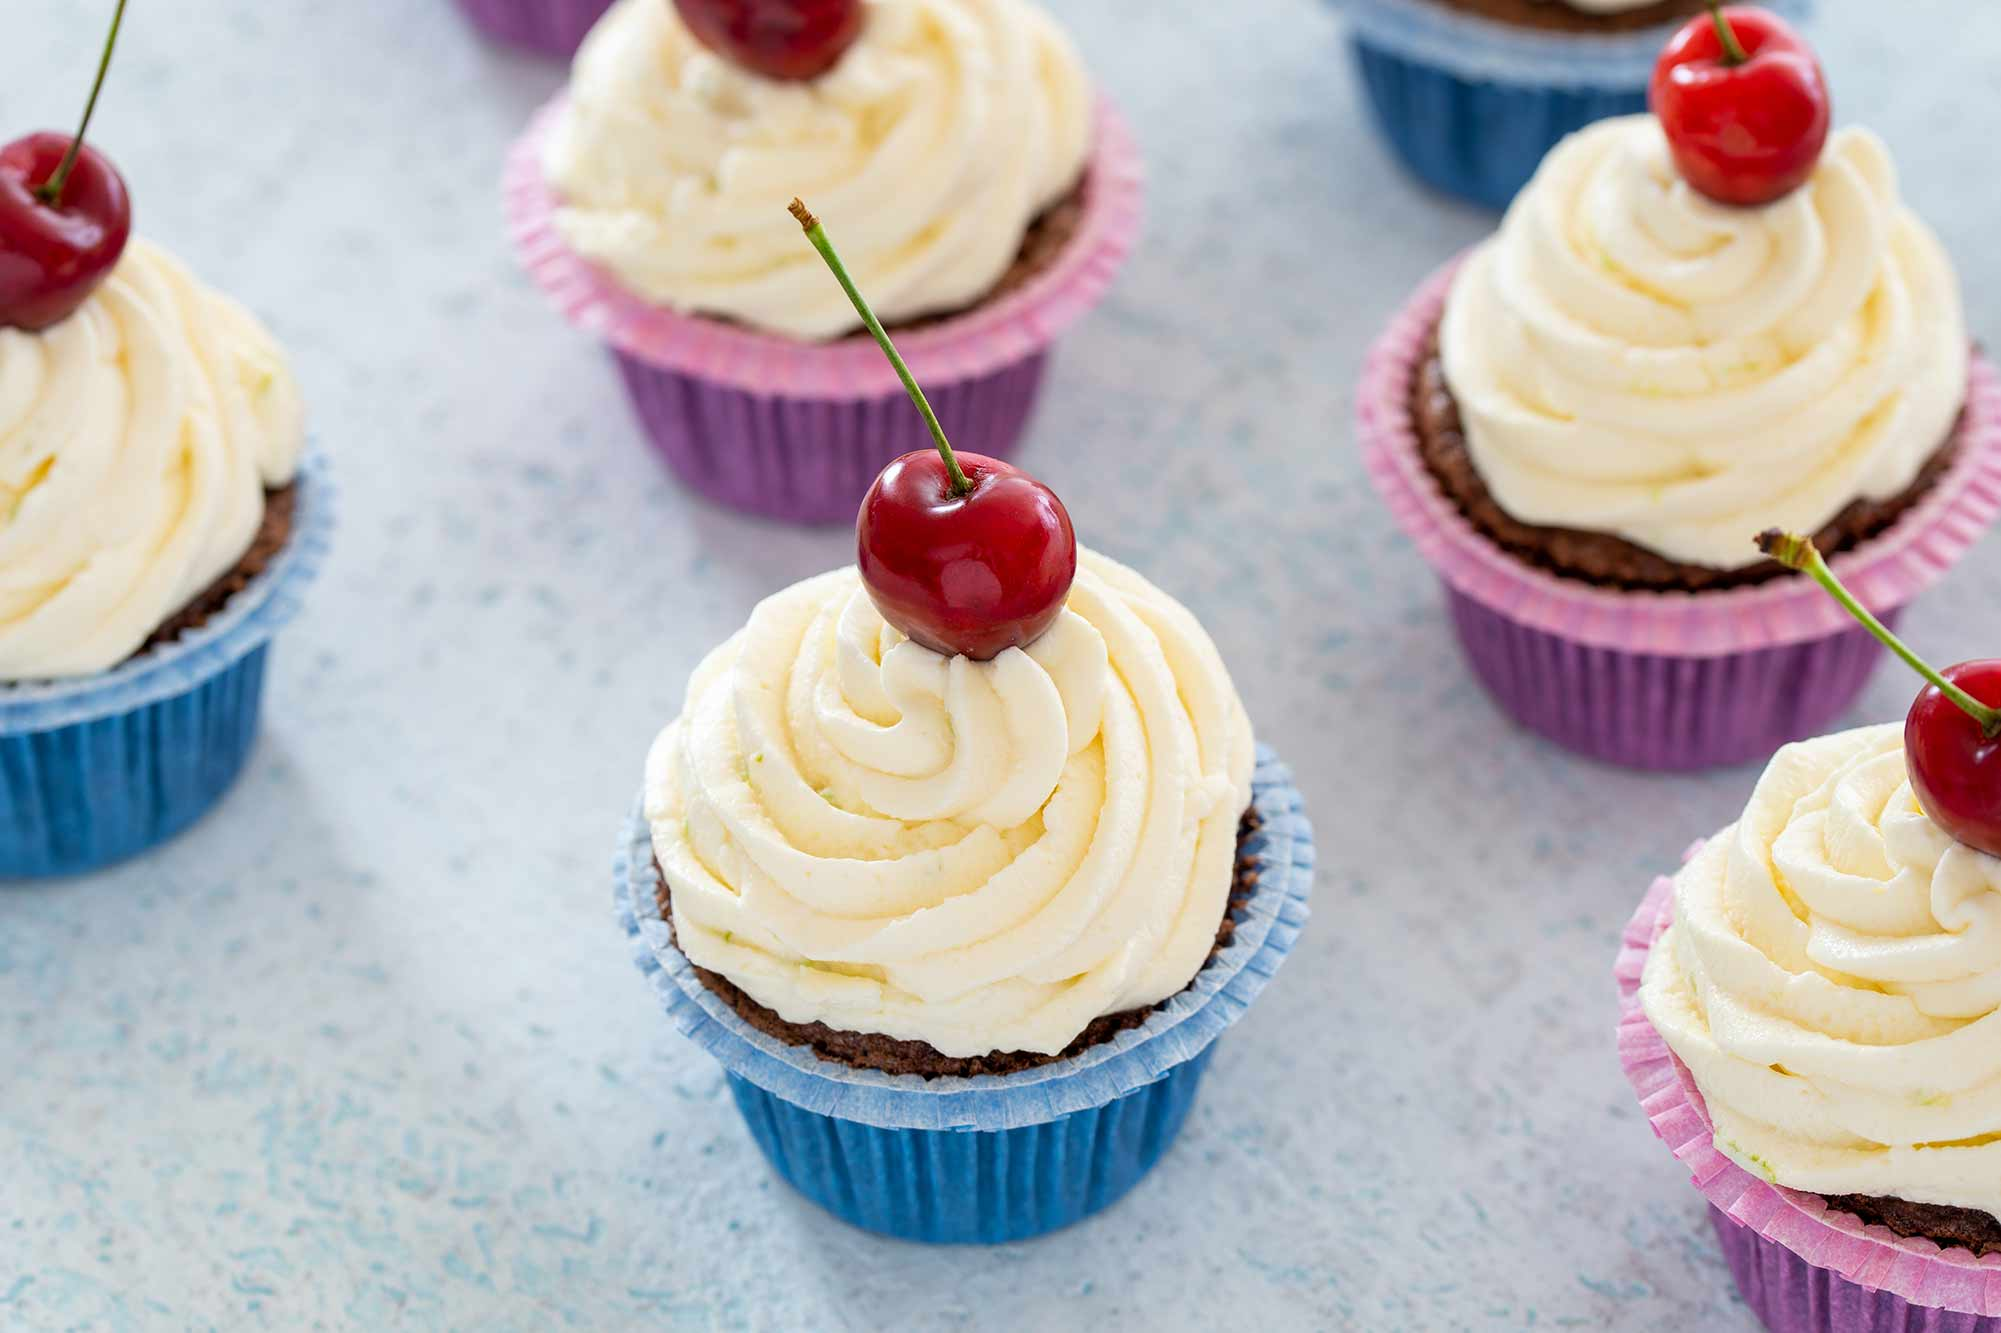 Riževi cupcakesi s češnjami